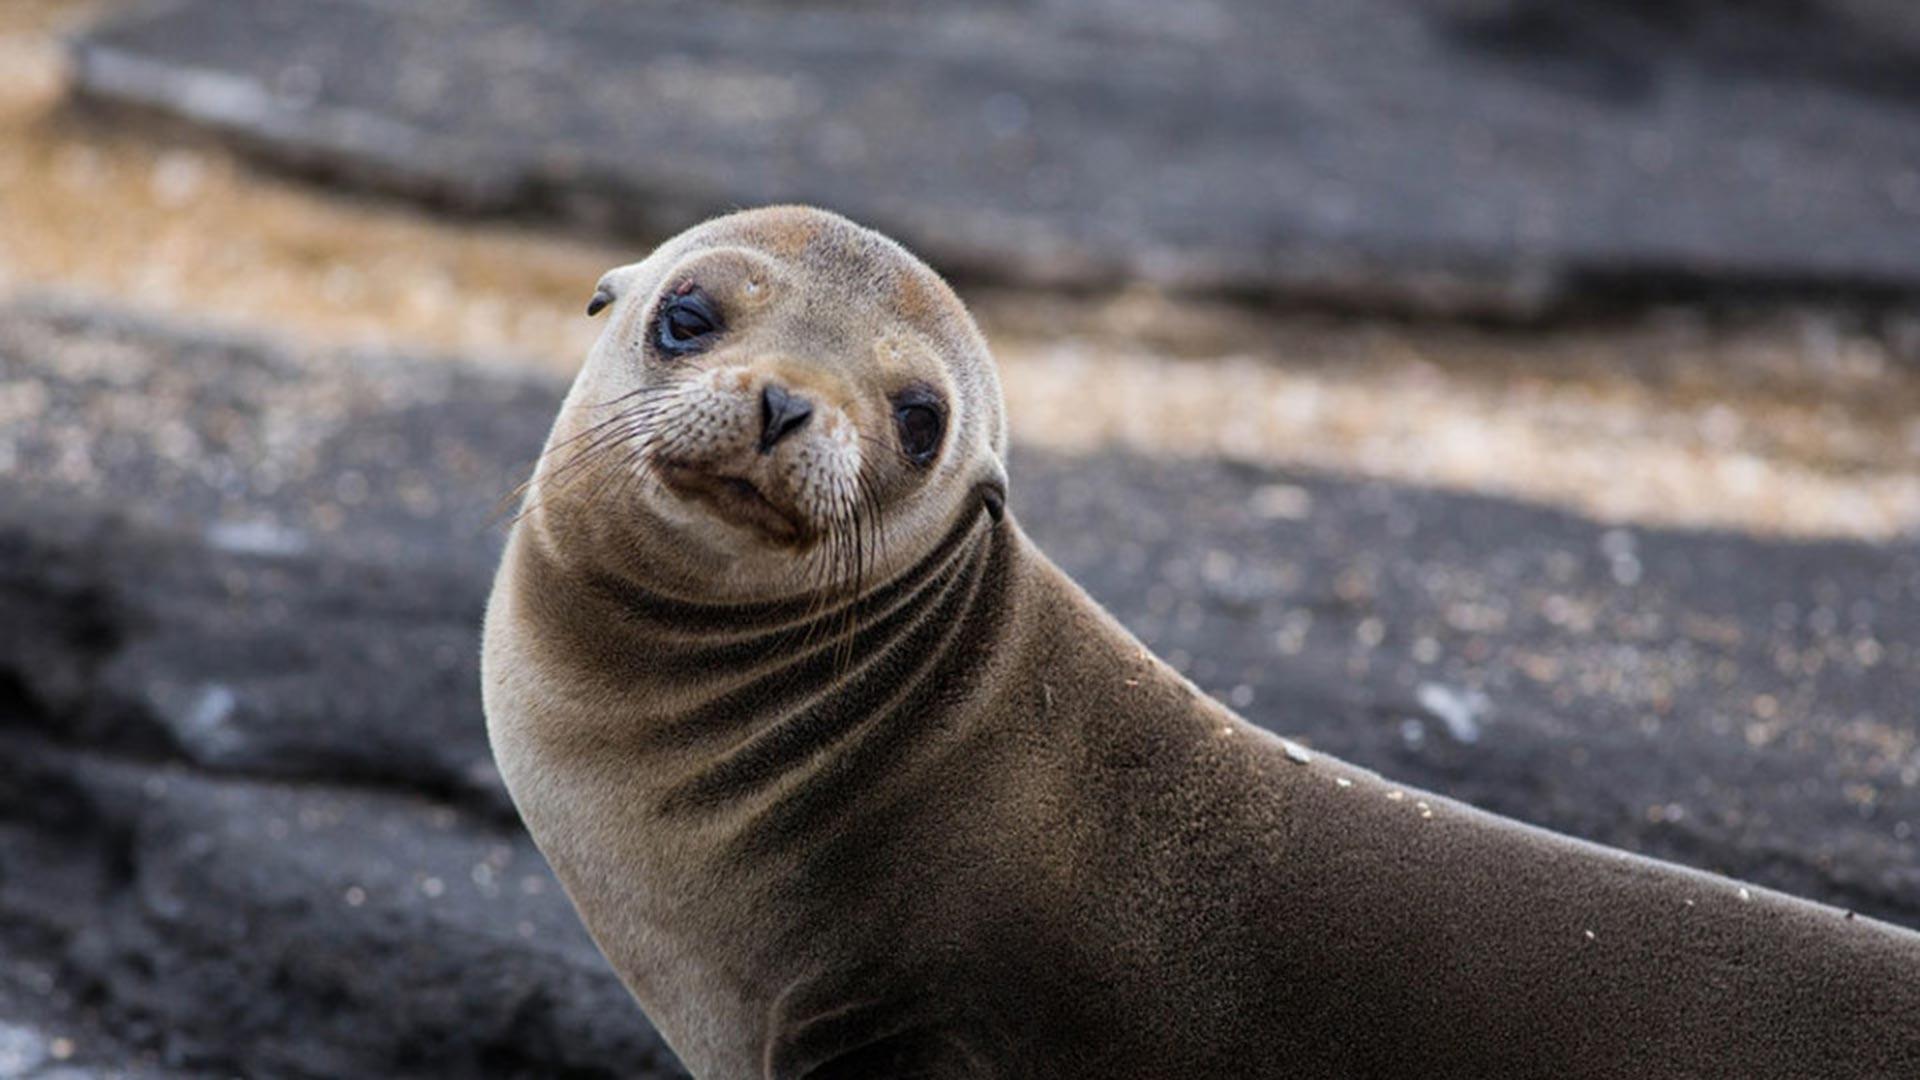 Fur Seal HD Wallpaper